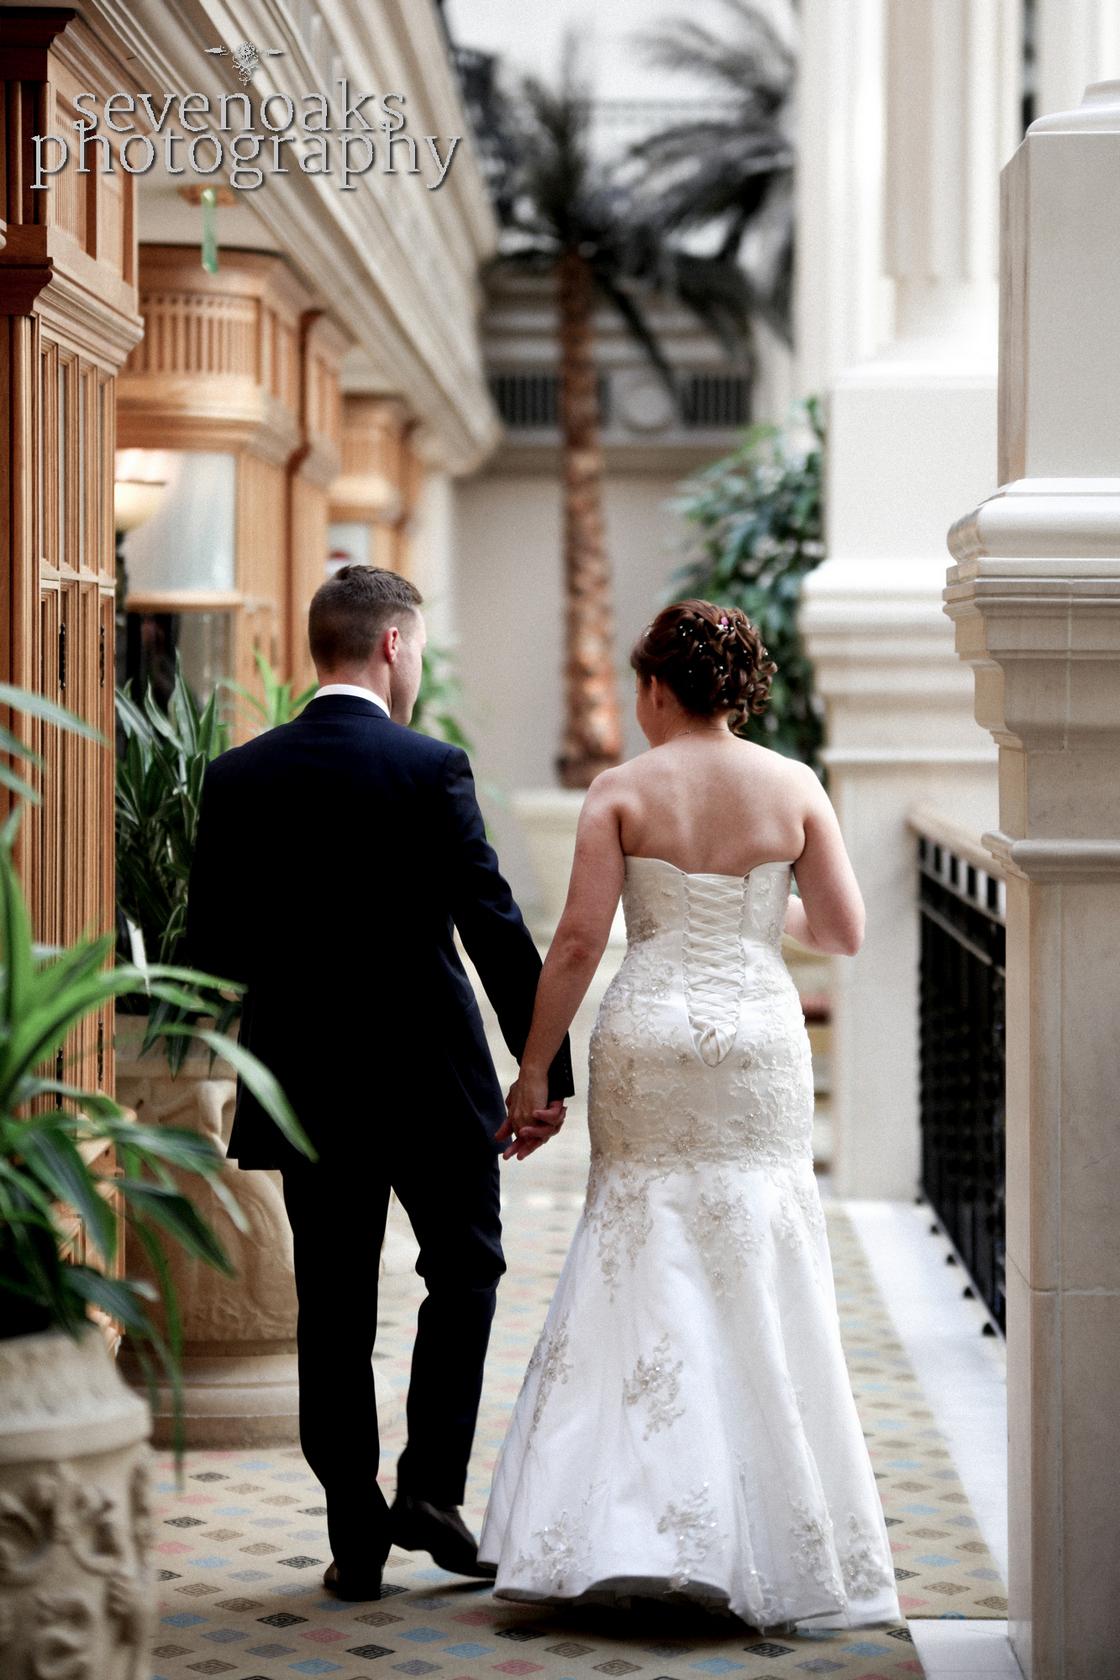 Sevenoaks documentary wedding photographer-30.jpg